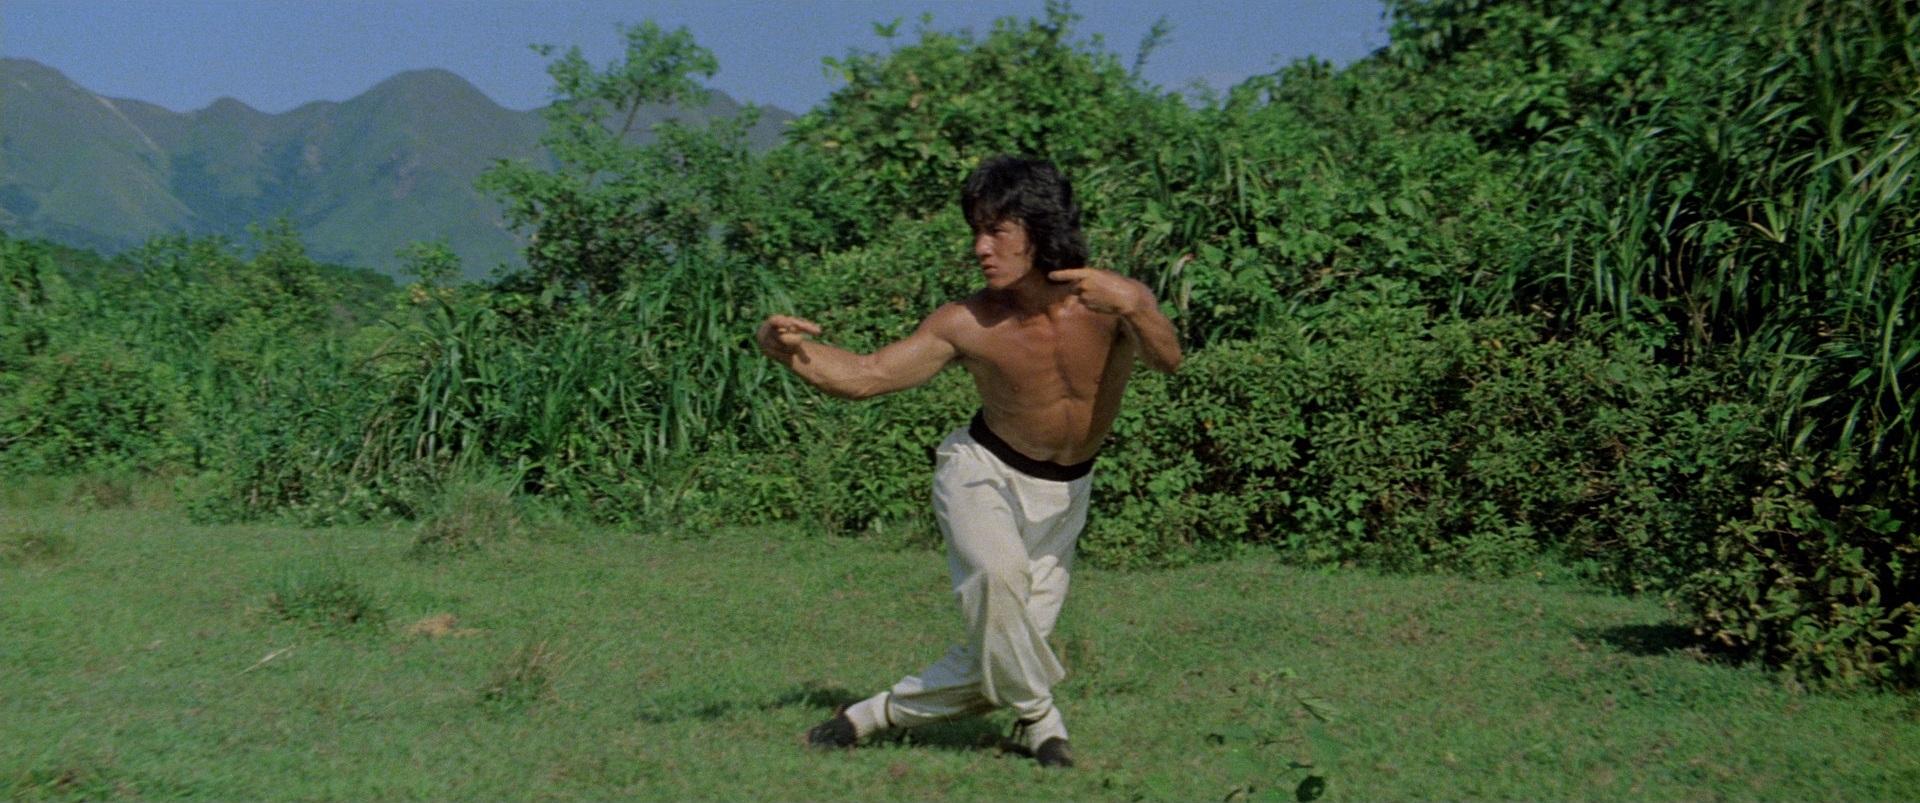 Jackie Chan in Zui quan (1978)